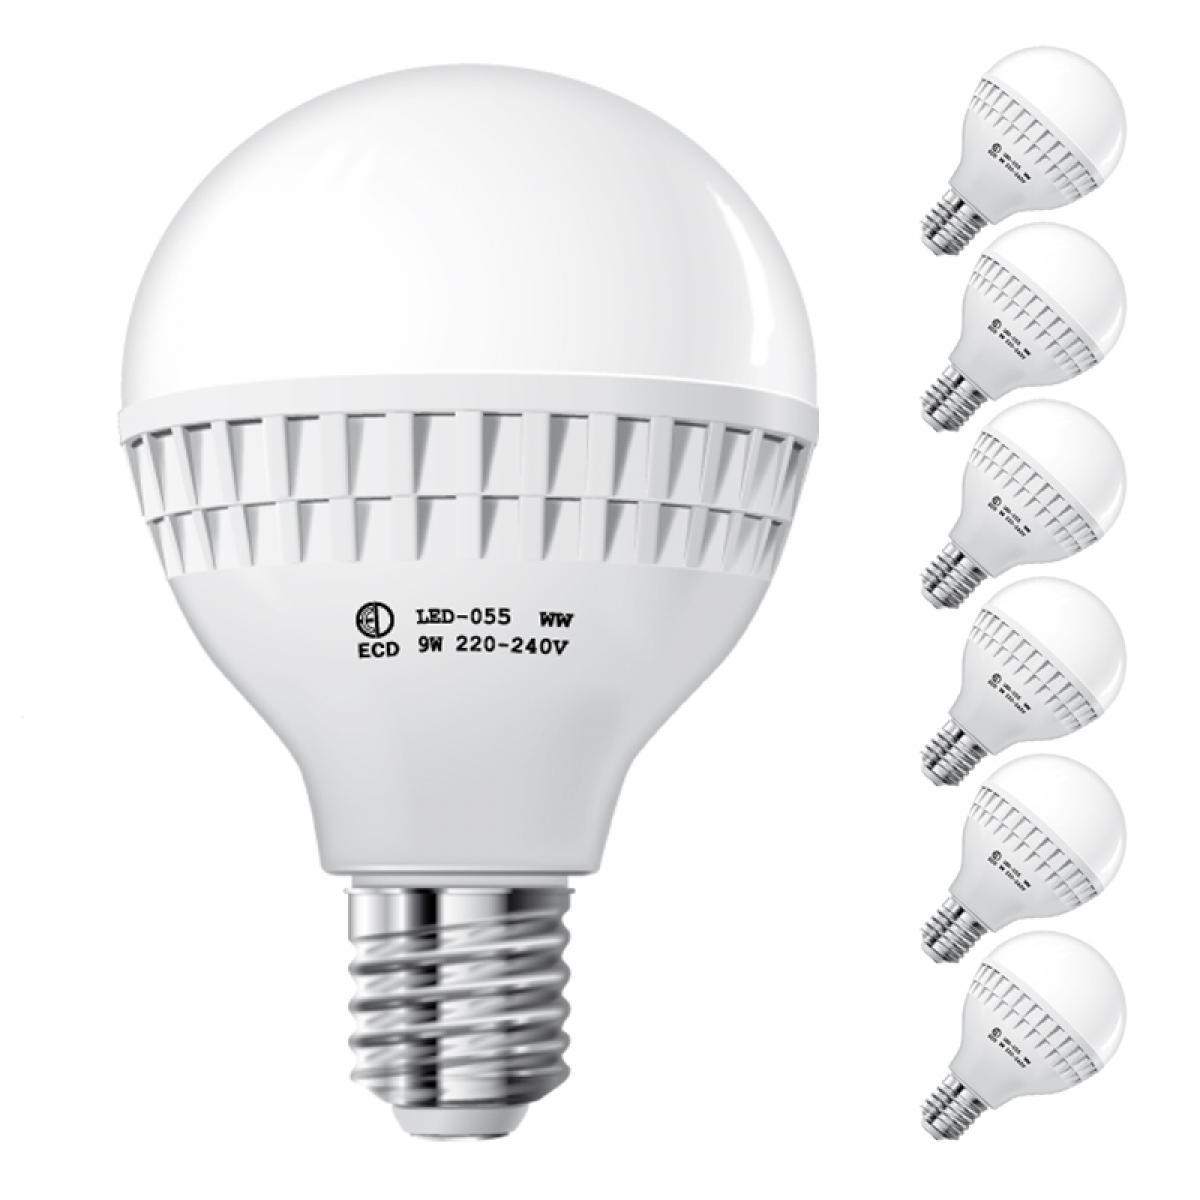 Ecd Germany ECD Germany 6 x 9W E27 LED Lampe   6000 Kelvin blanc froid   584 lumens   220-240 V   remplace une ampoule halogène de 6